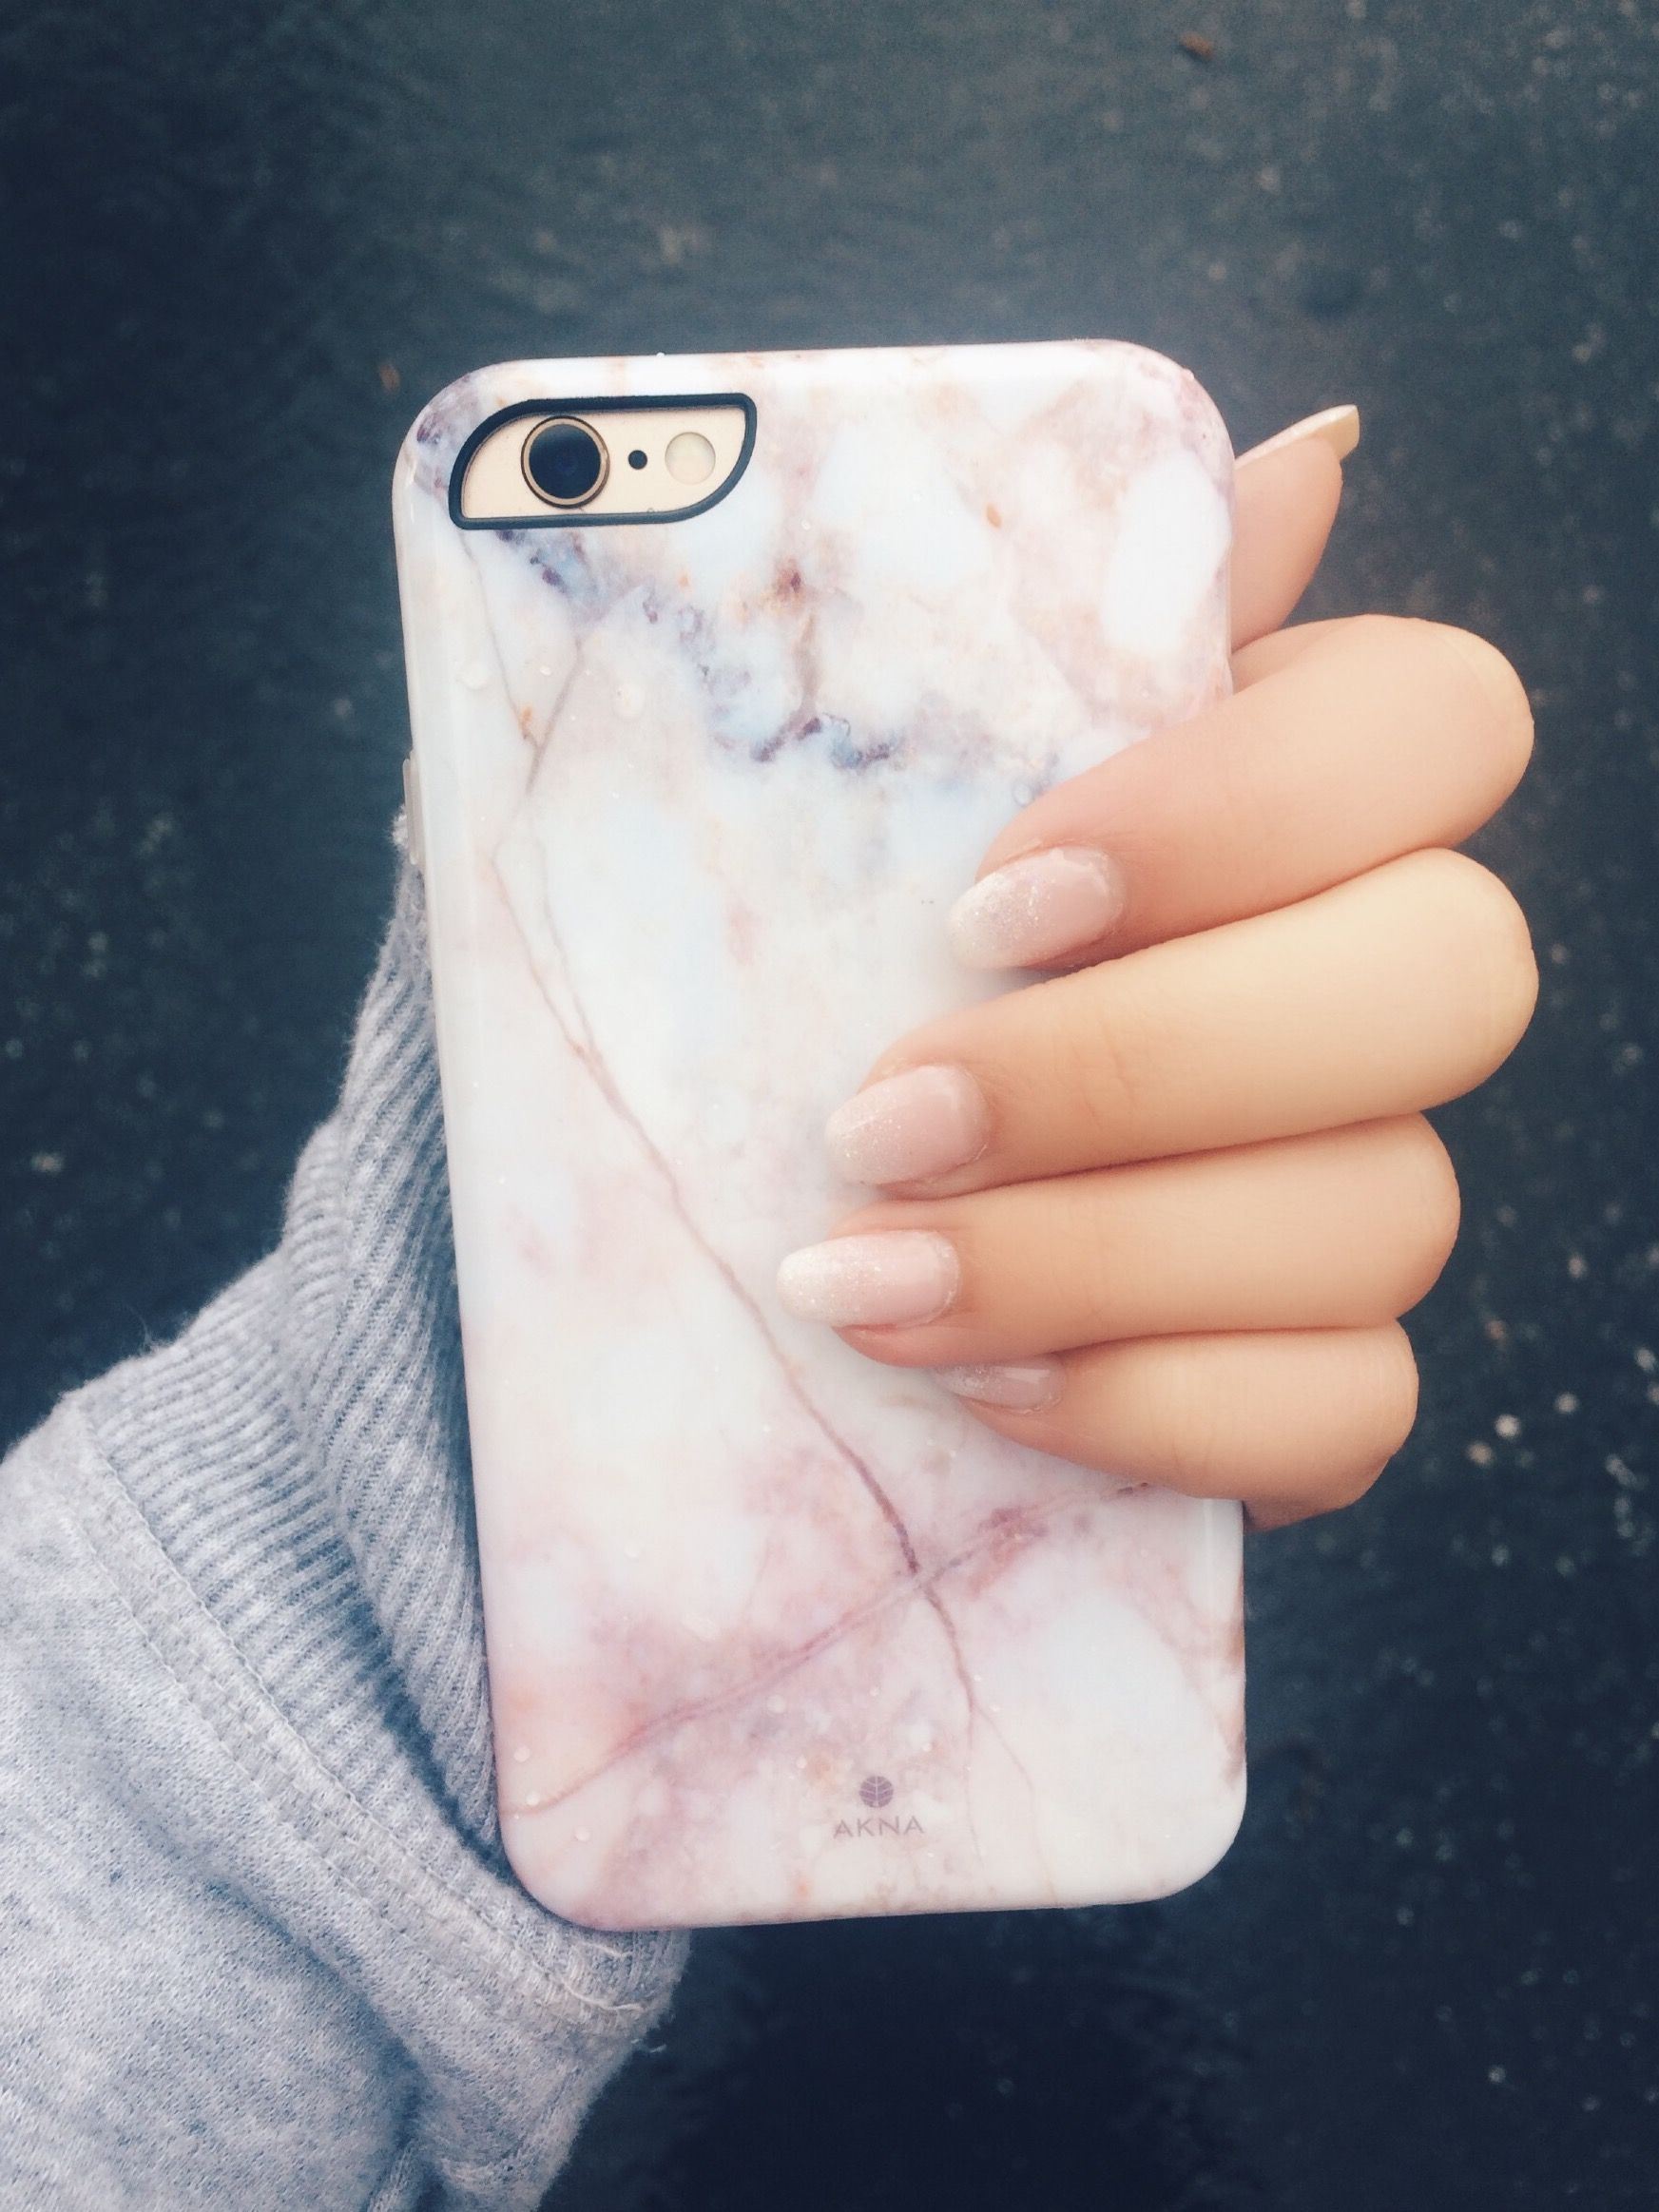 akna coque iphone 6